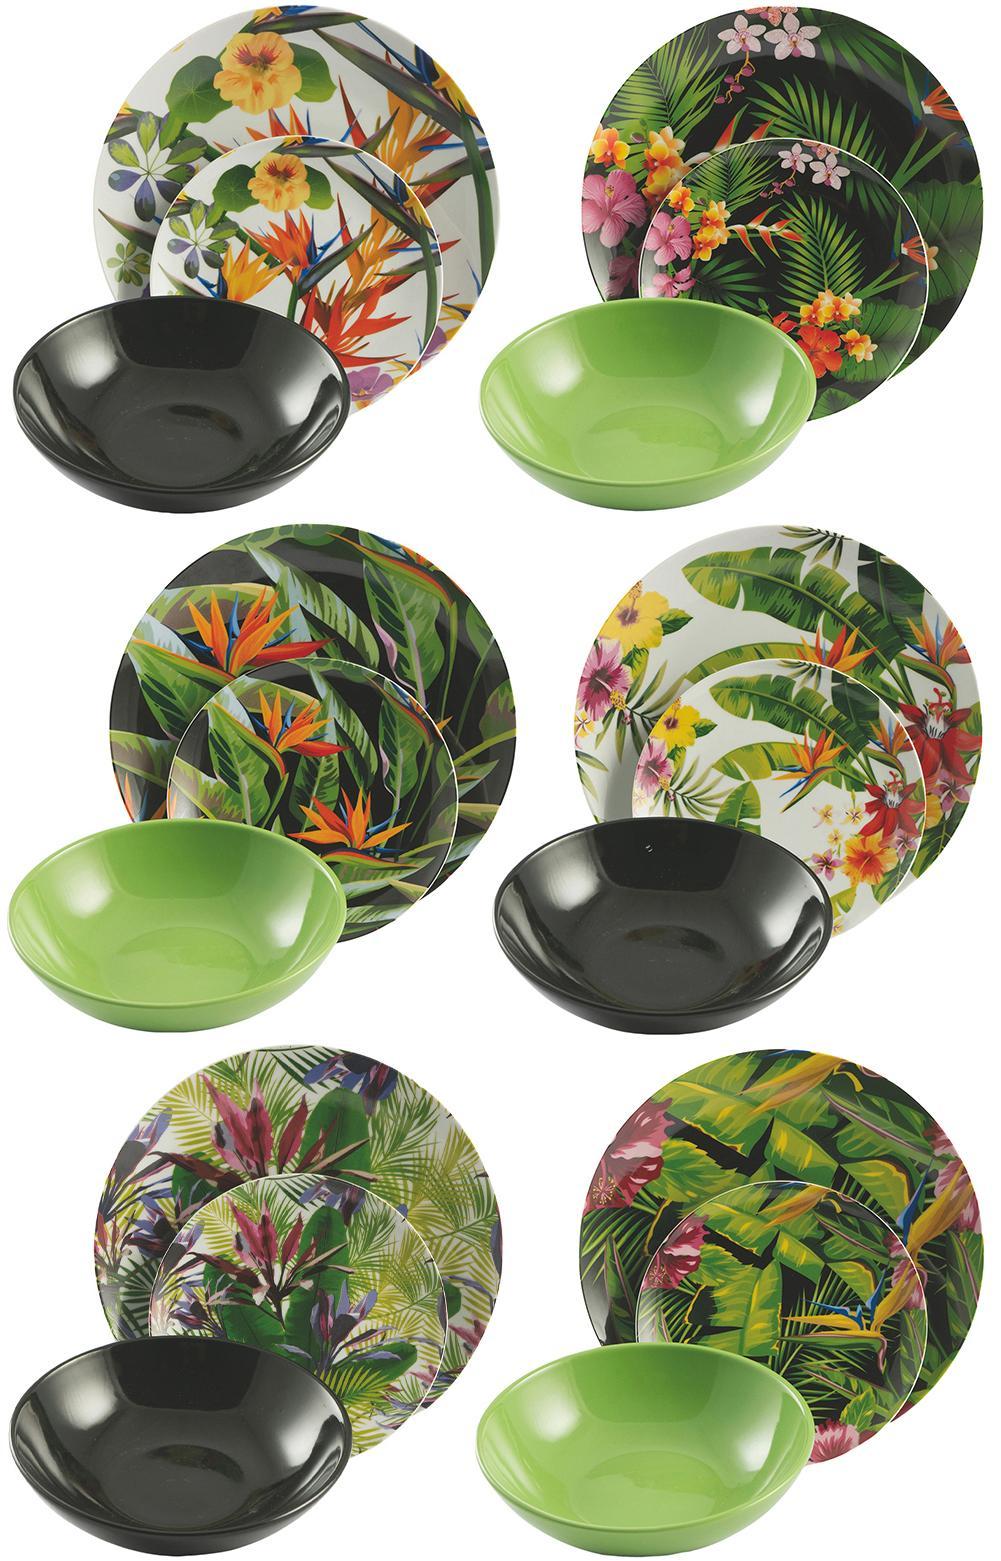 Vajilla Tropical Jungle, 6comensales (18pzas.), Multicolor, Set de diferentes tamaños